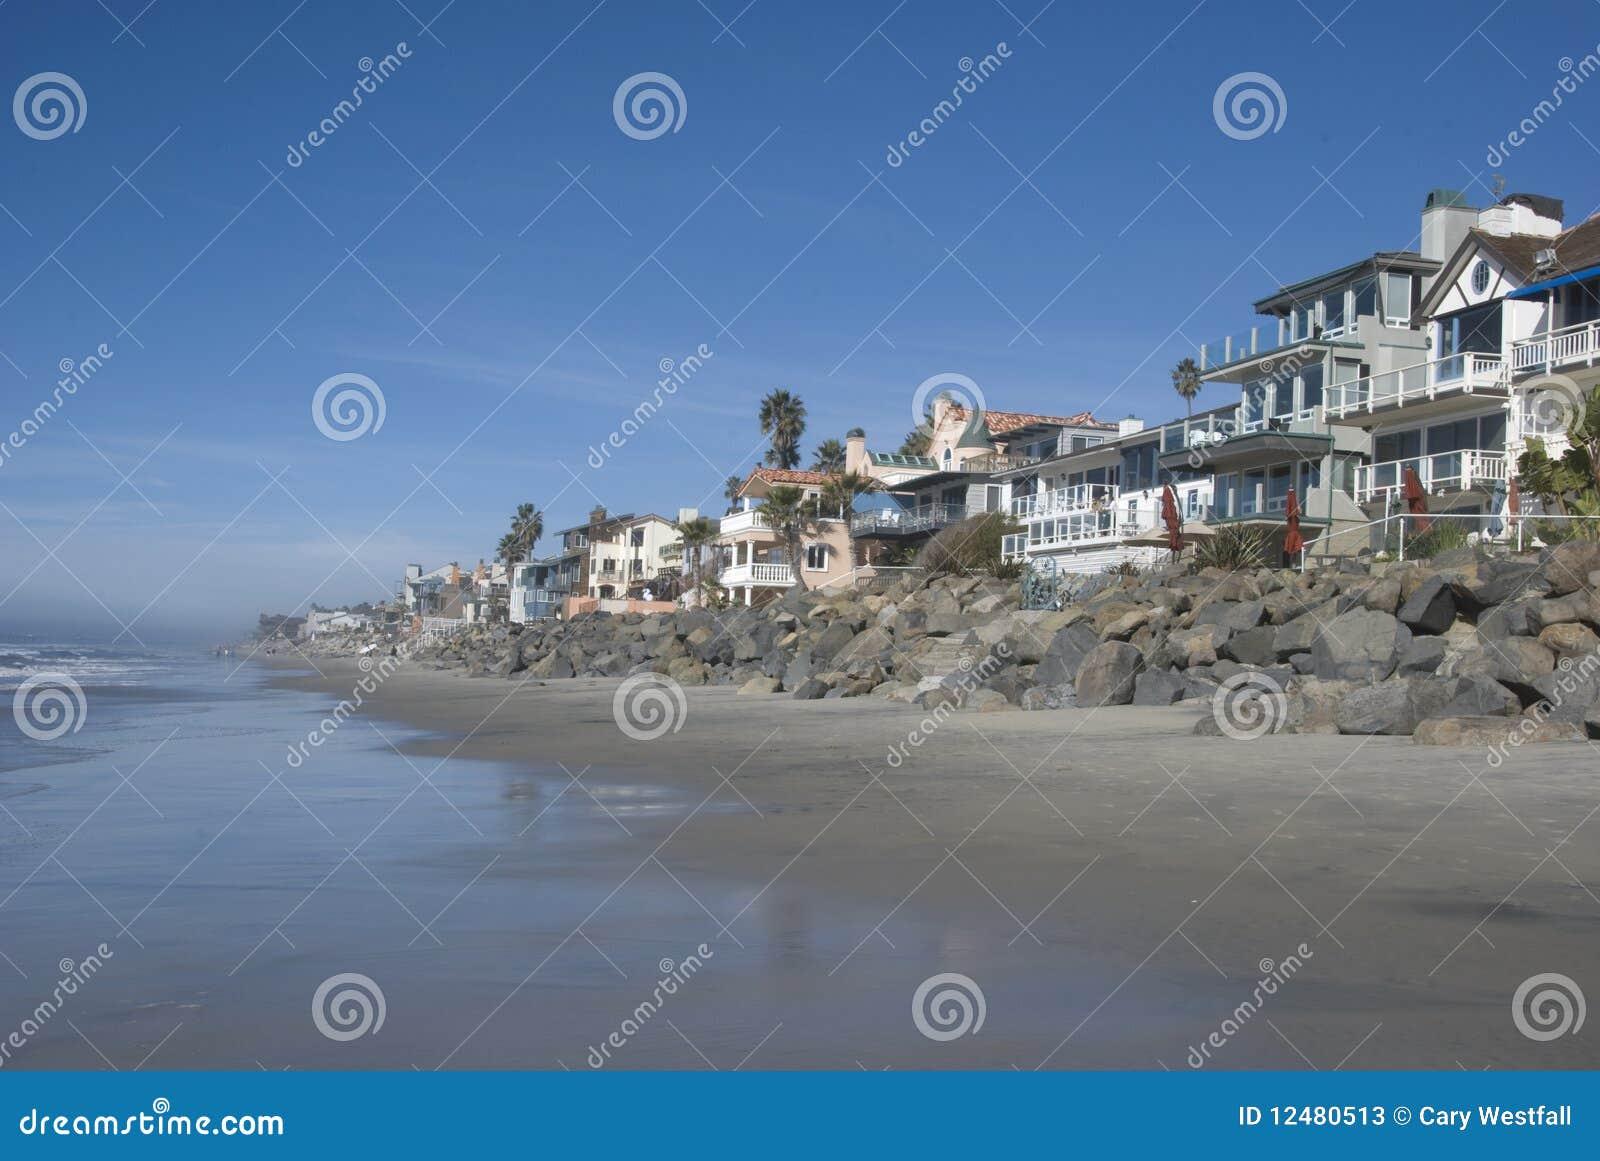 Una playa meridional de California